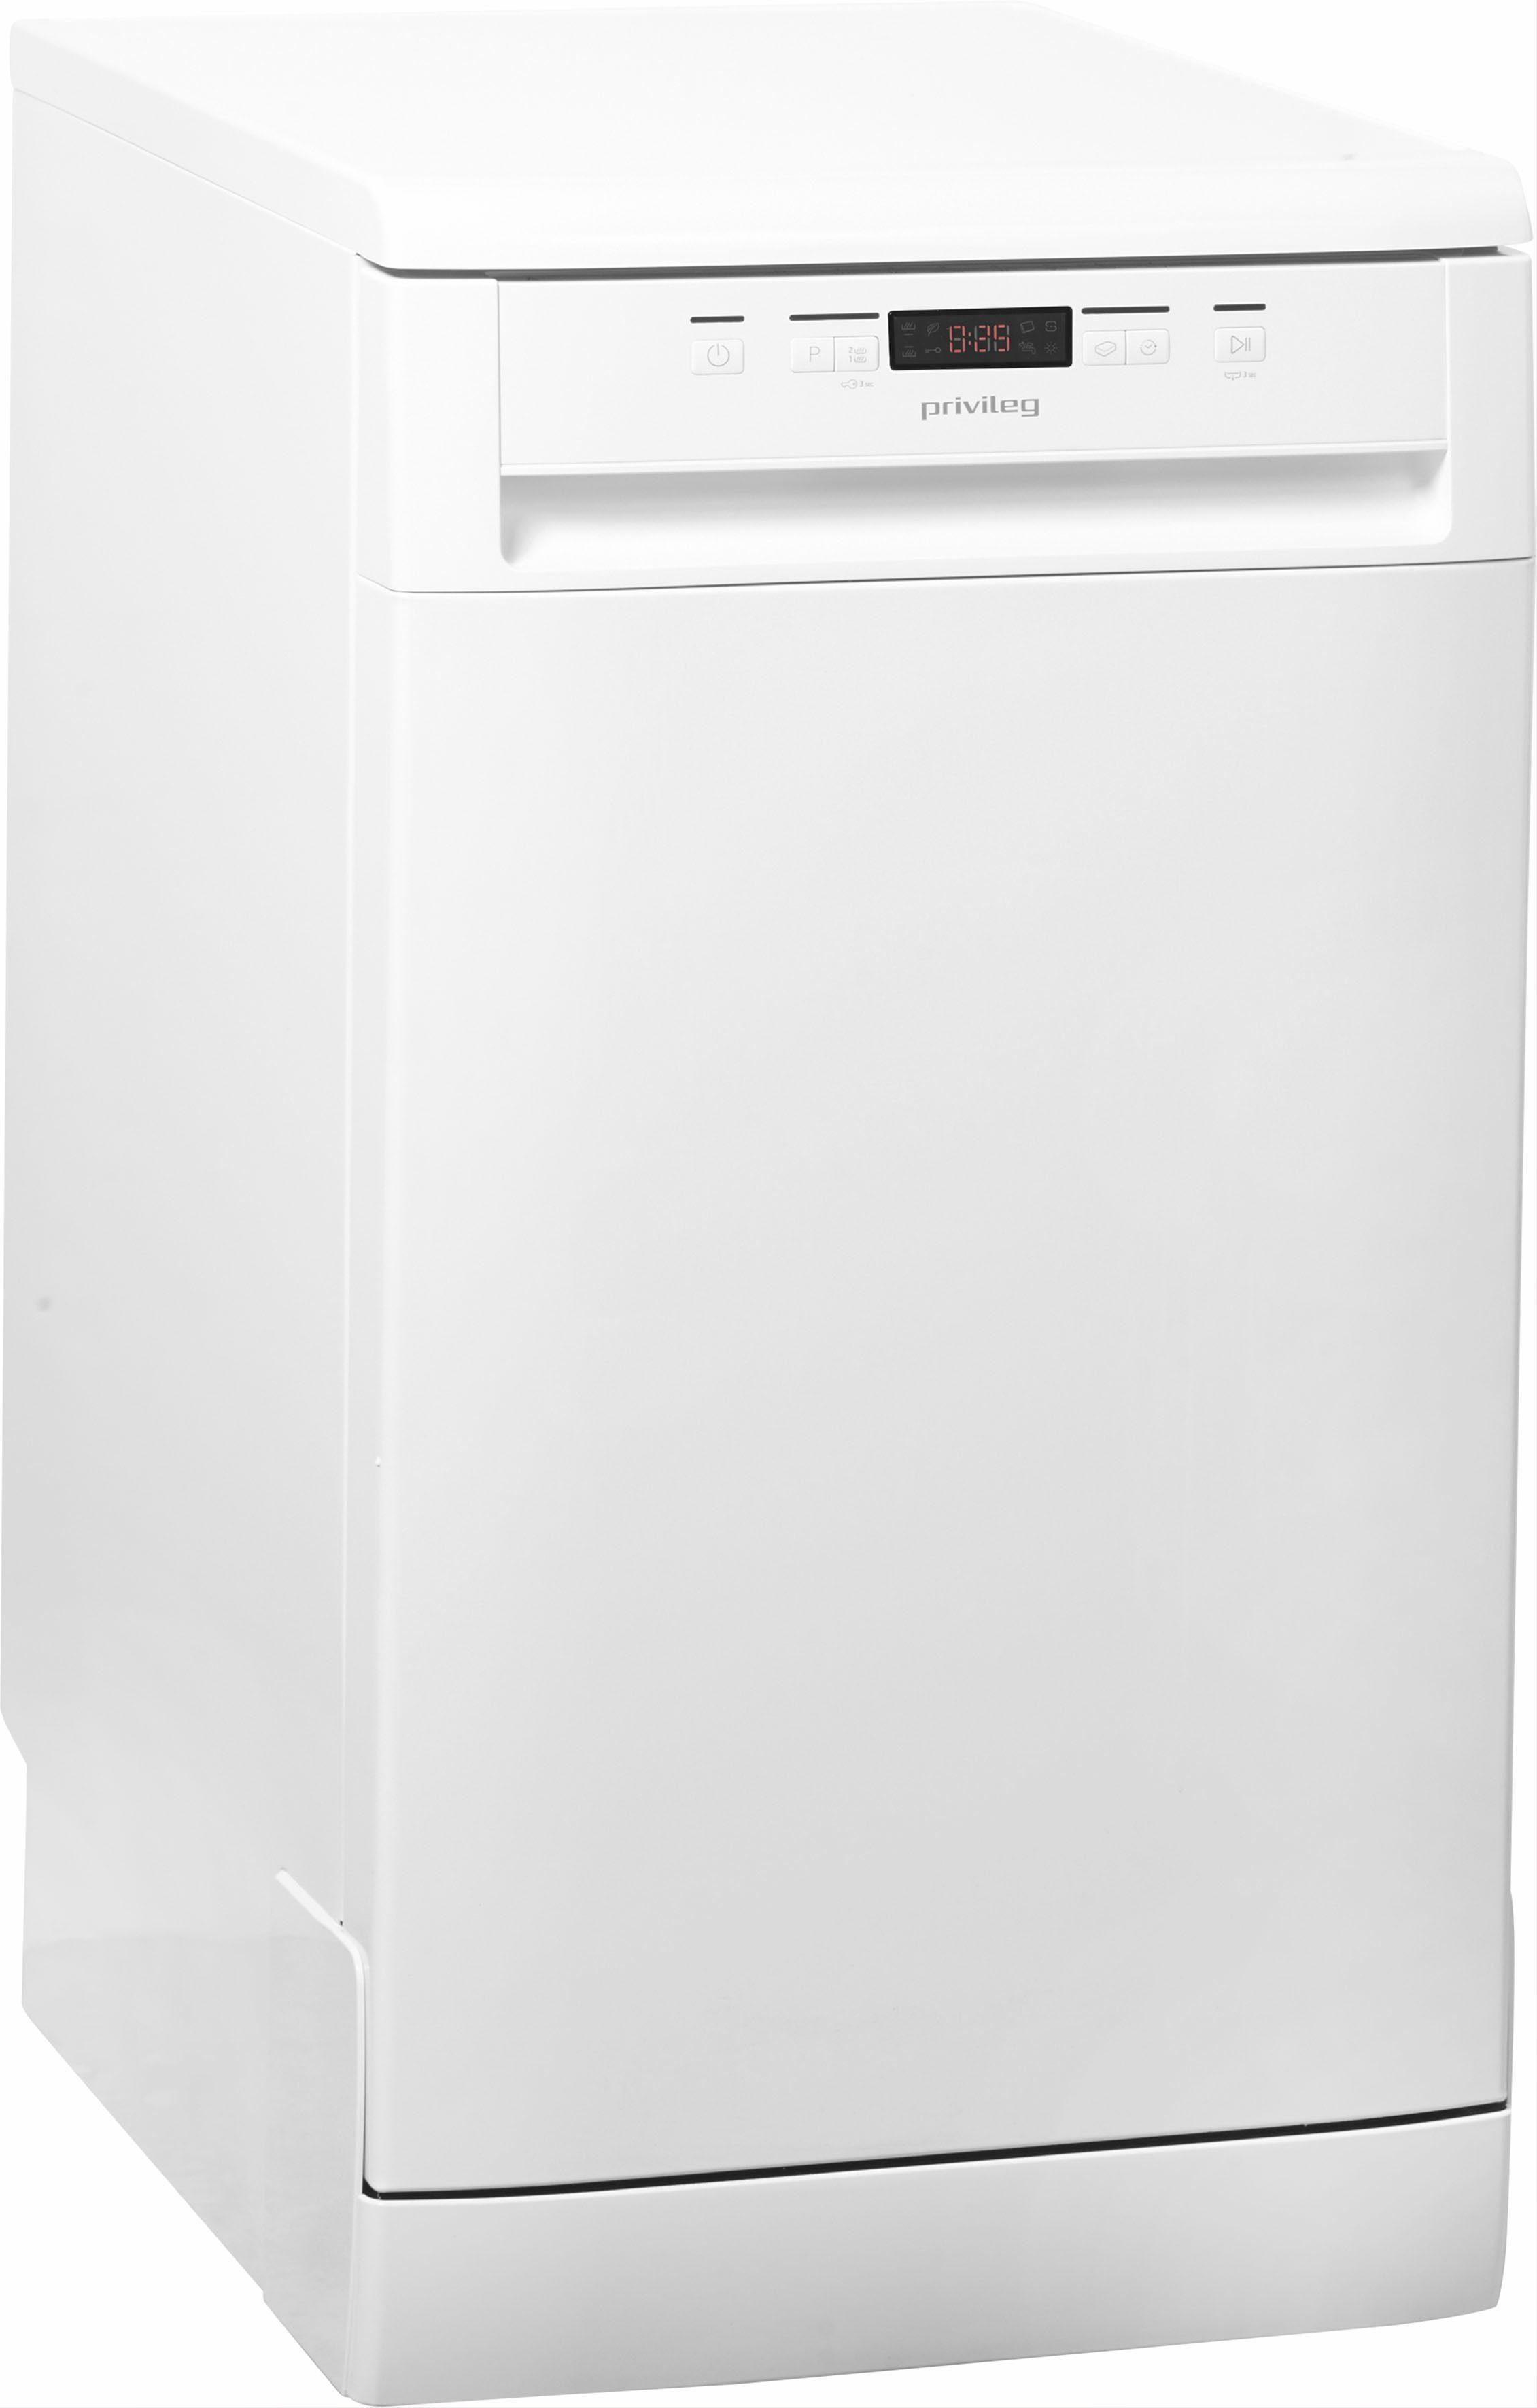 Privileg Standgeschirrspüler, RSFC 3B26, 9 l, 10 Maßgedecke, 45 cm breit